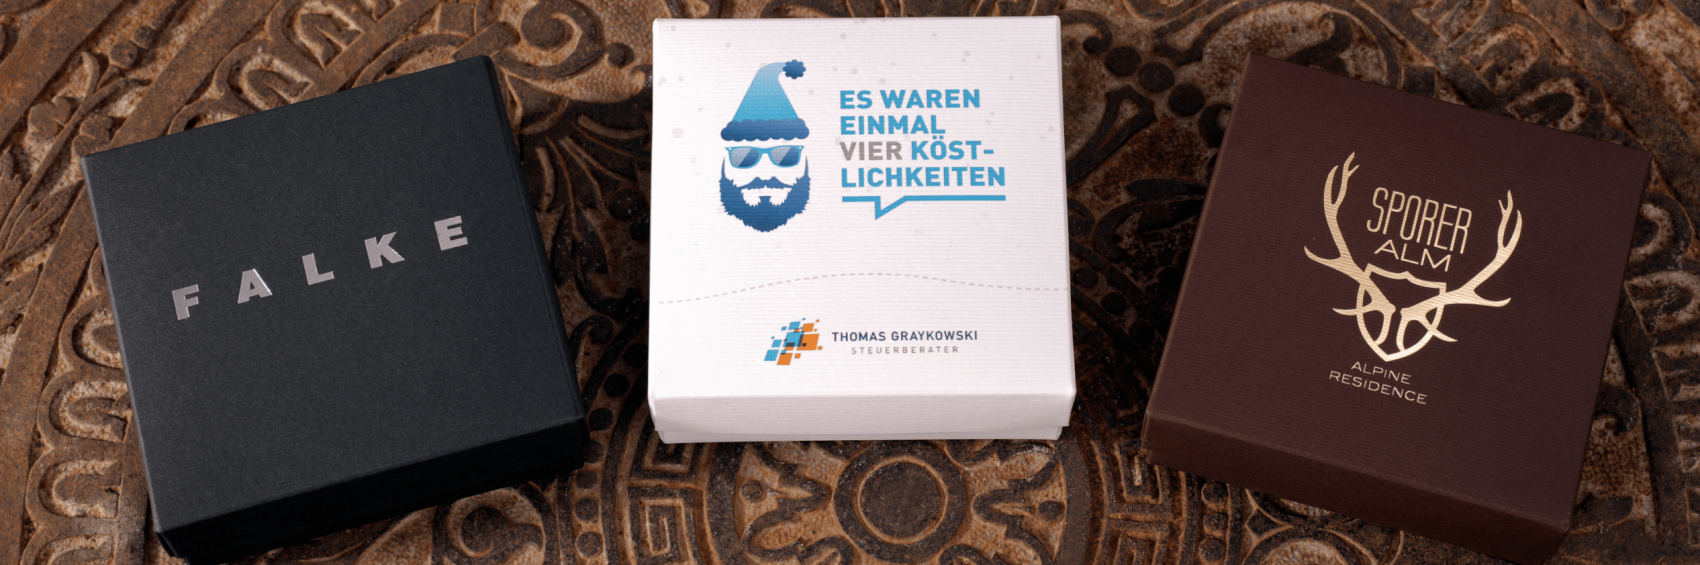 vinchoc_InhaltUndVeredelung_header_IMG_6171